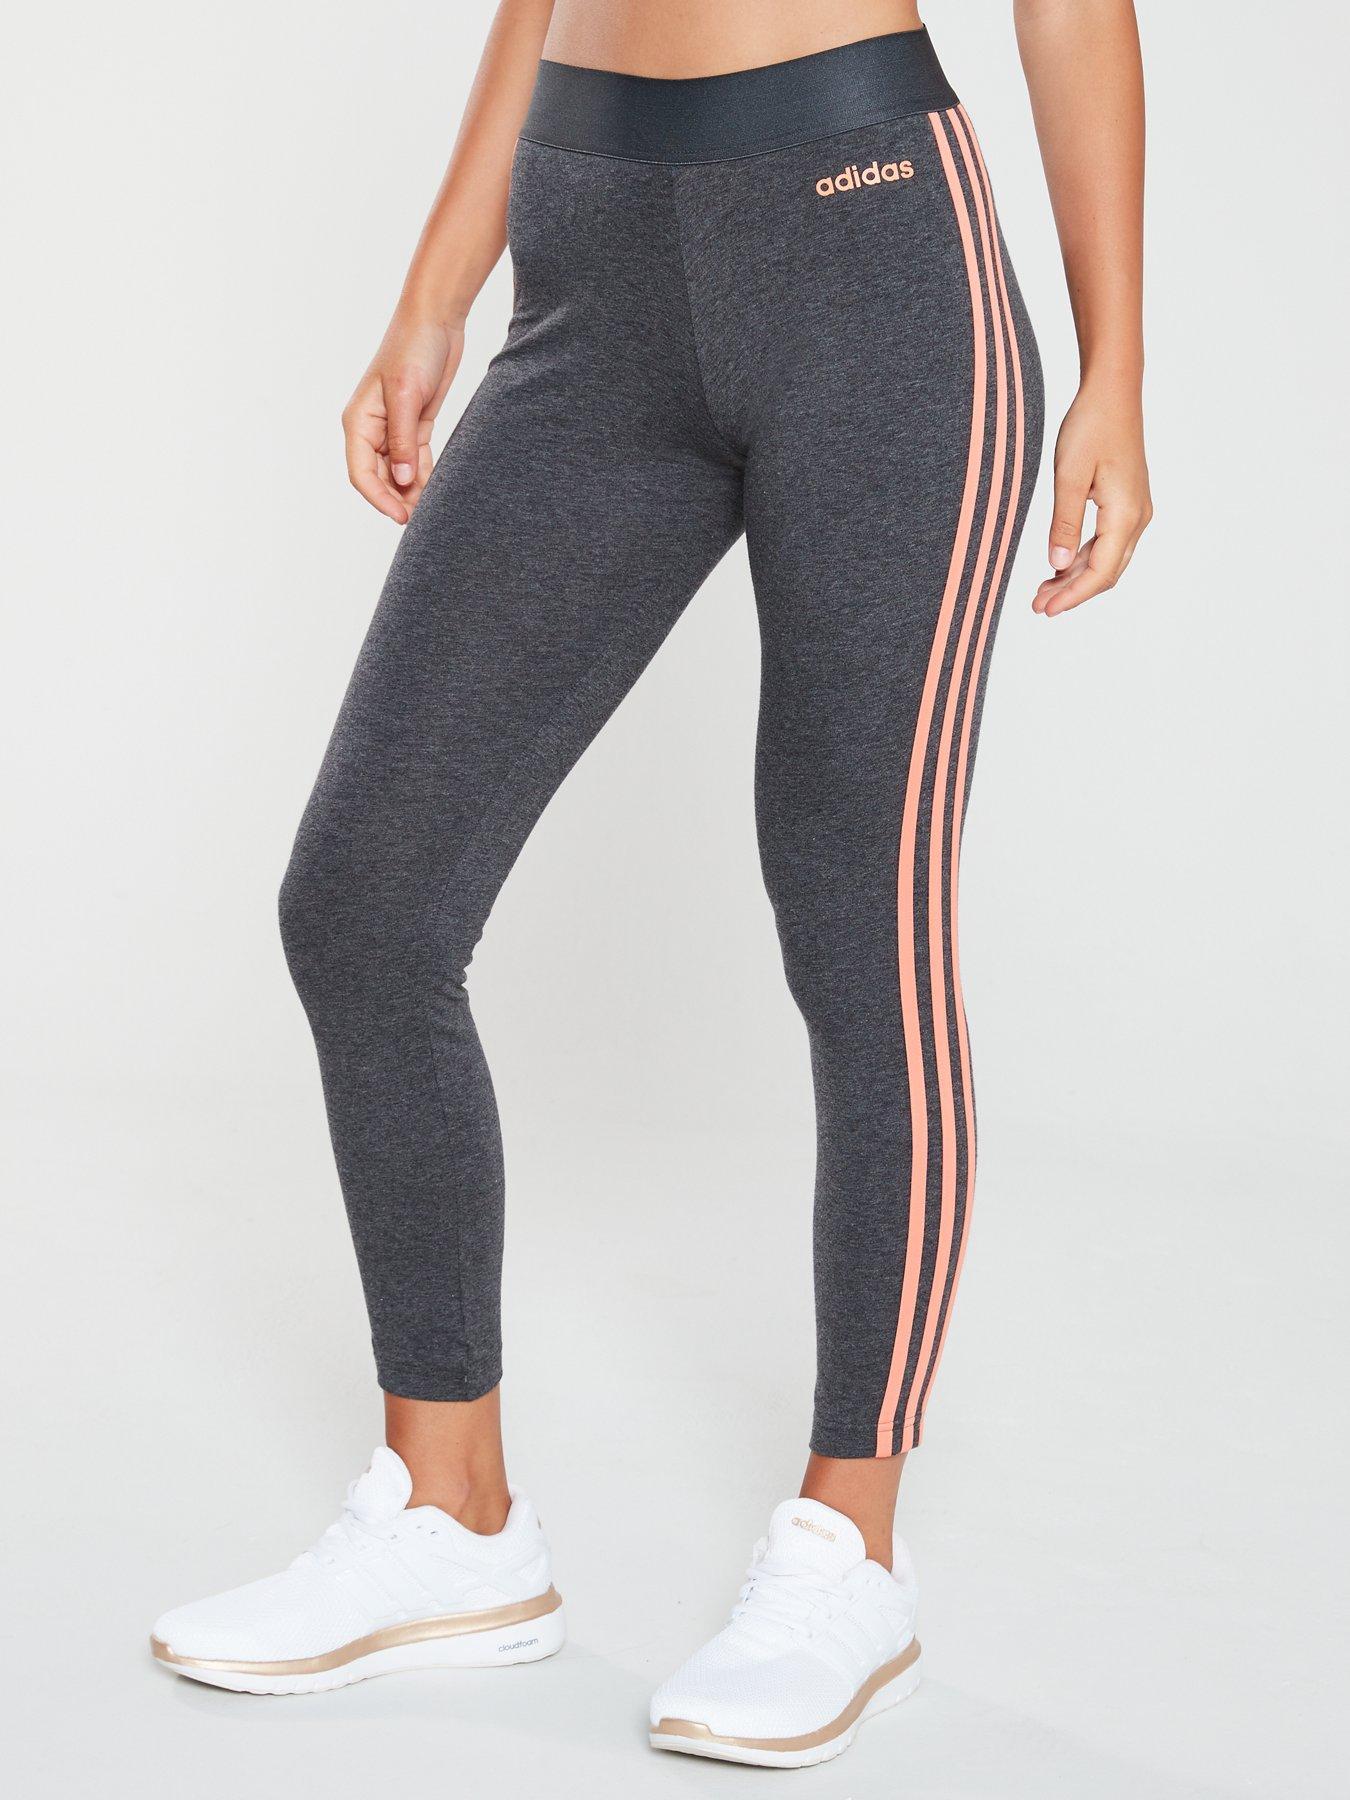 Sports AdidasTightsamp; Leggings Womens Sports Sports Clothing Womens Clothing Womens Leggings AdidasTightsamp; Leggings AdidasTightsamp; QthdBrxsC